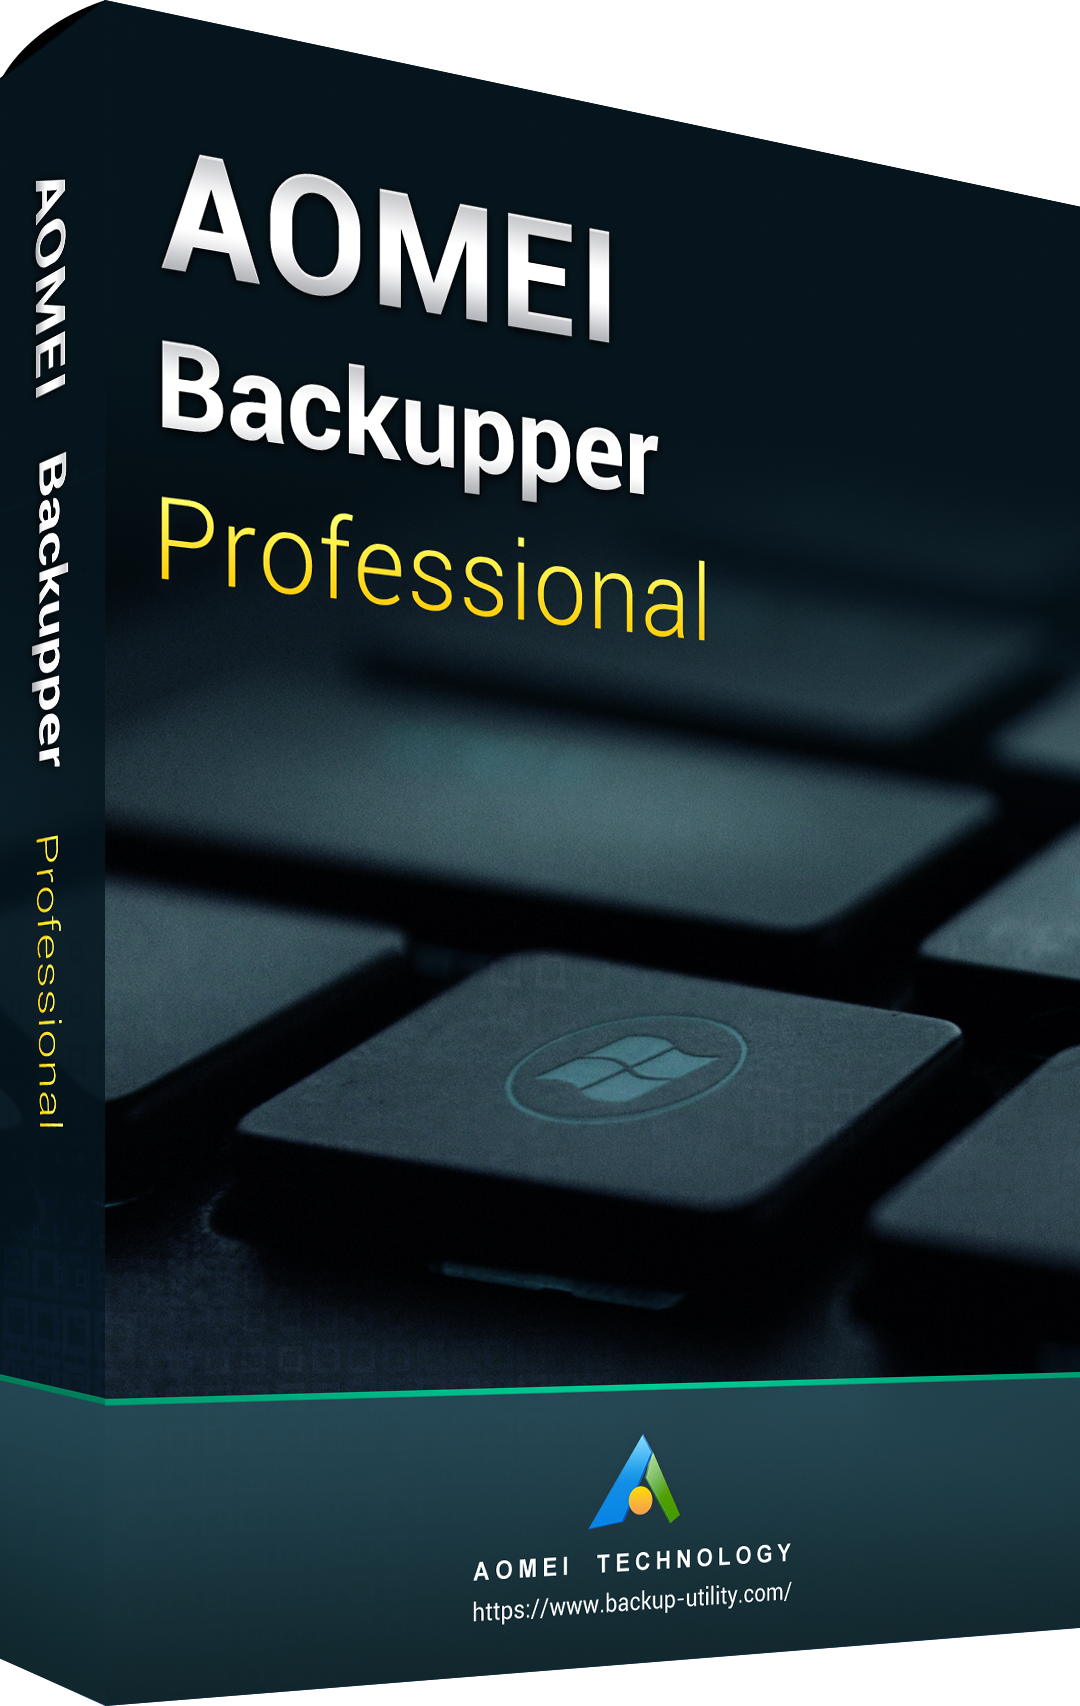 AOMEI Backupper Professional 5.6 Key Global